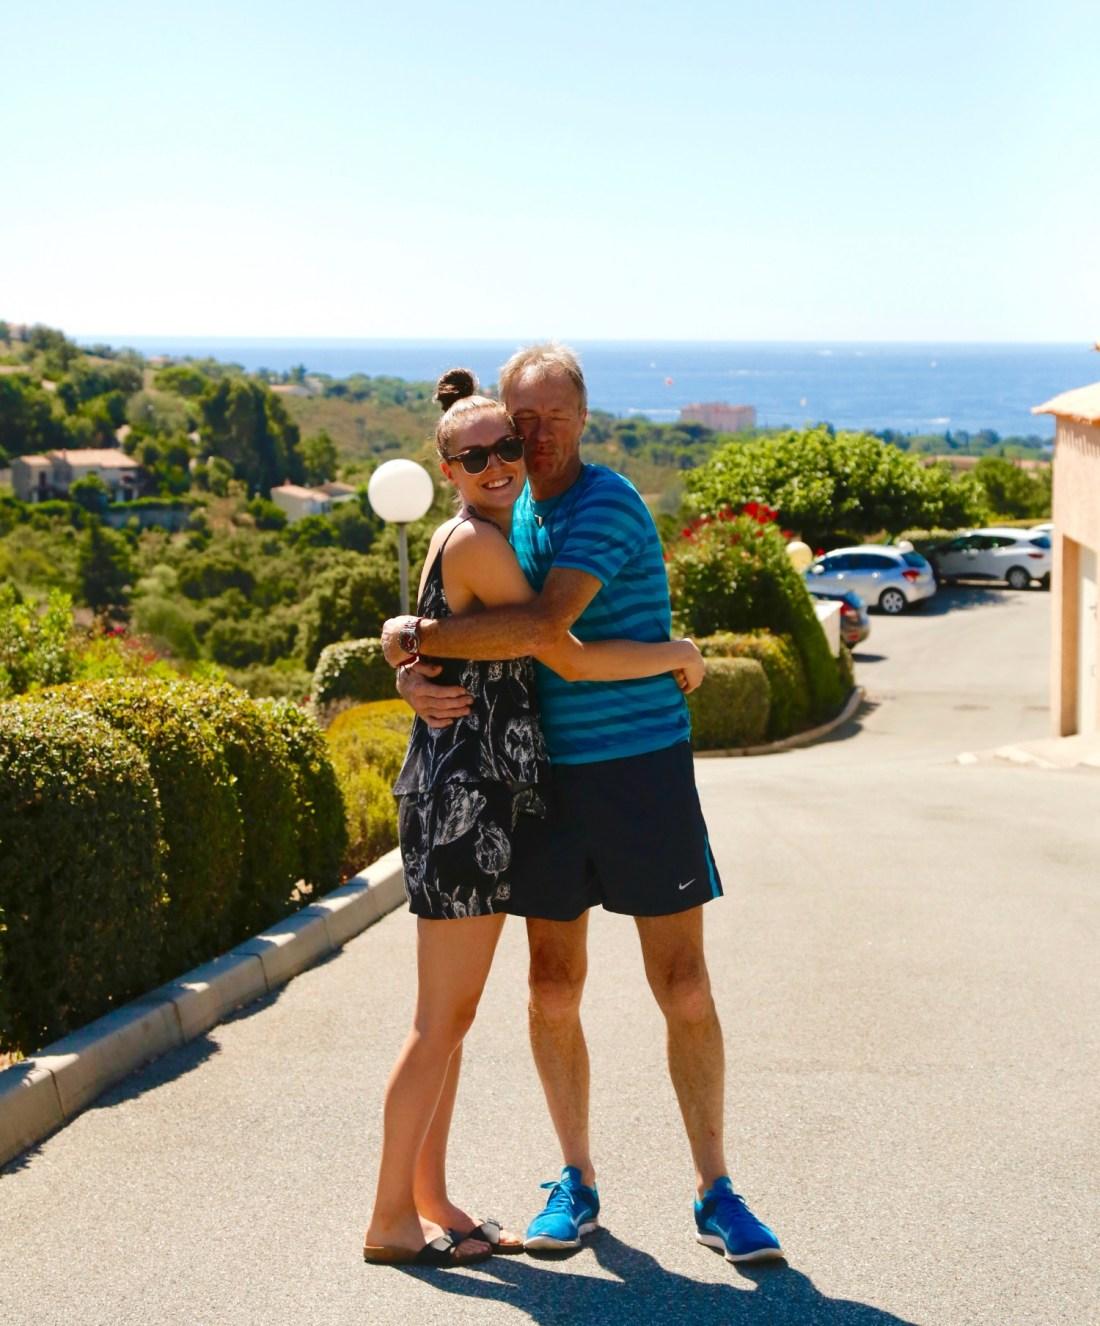 Alt gik galt før det lykkedes - Sydfrankrig Christine Bonde blog2